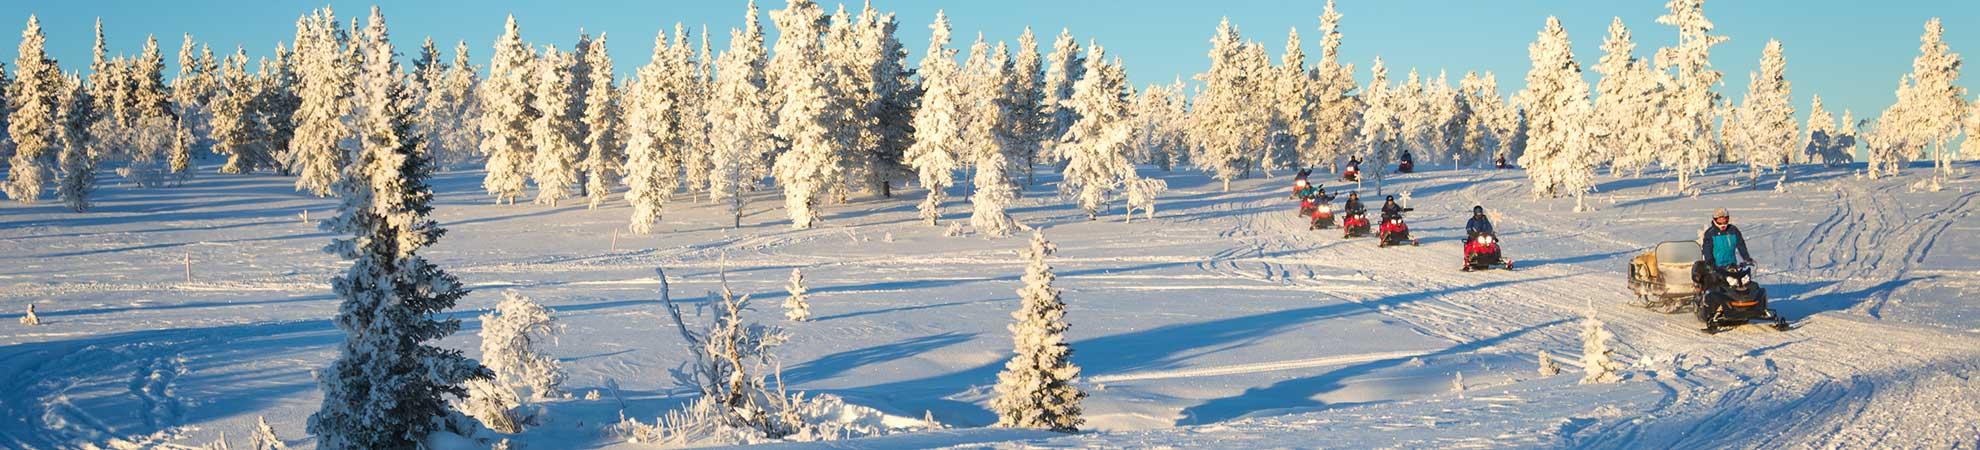 Motoneige Québec en hiver au Canada